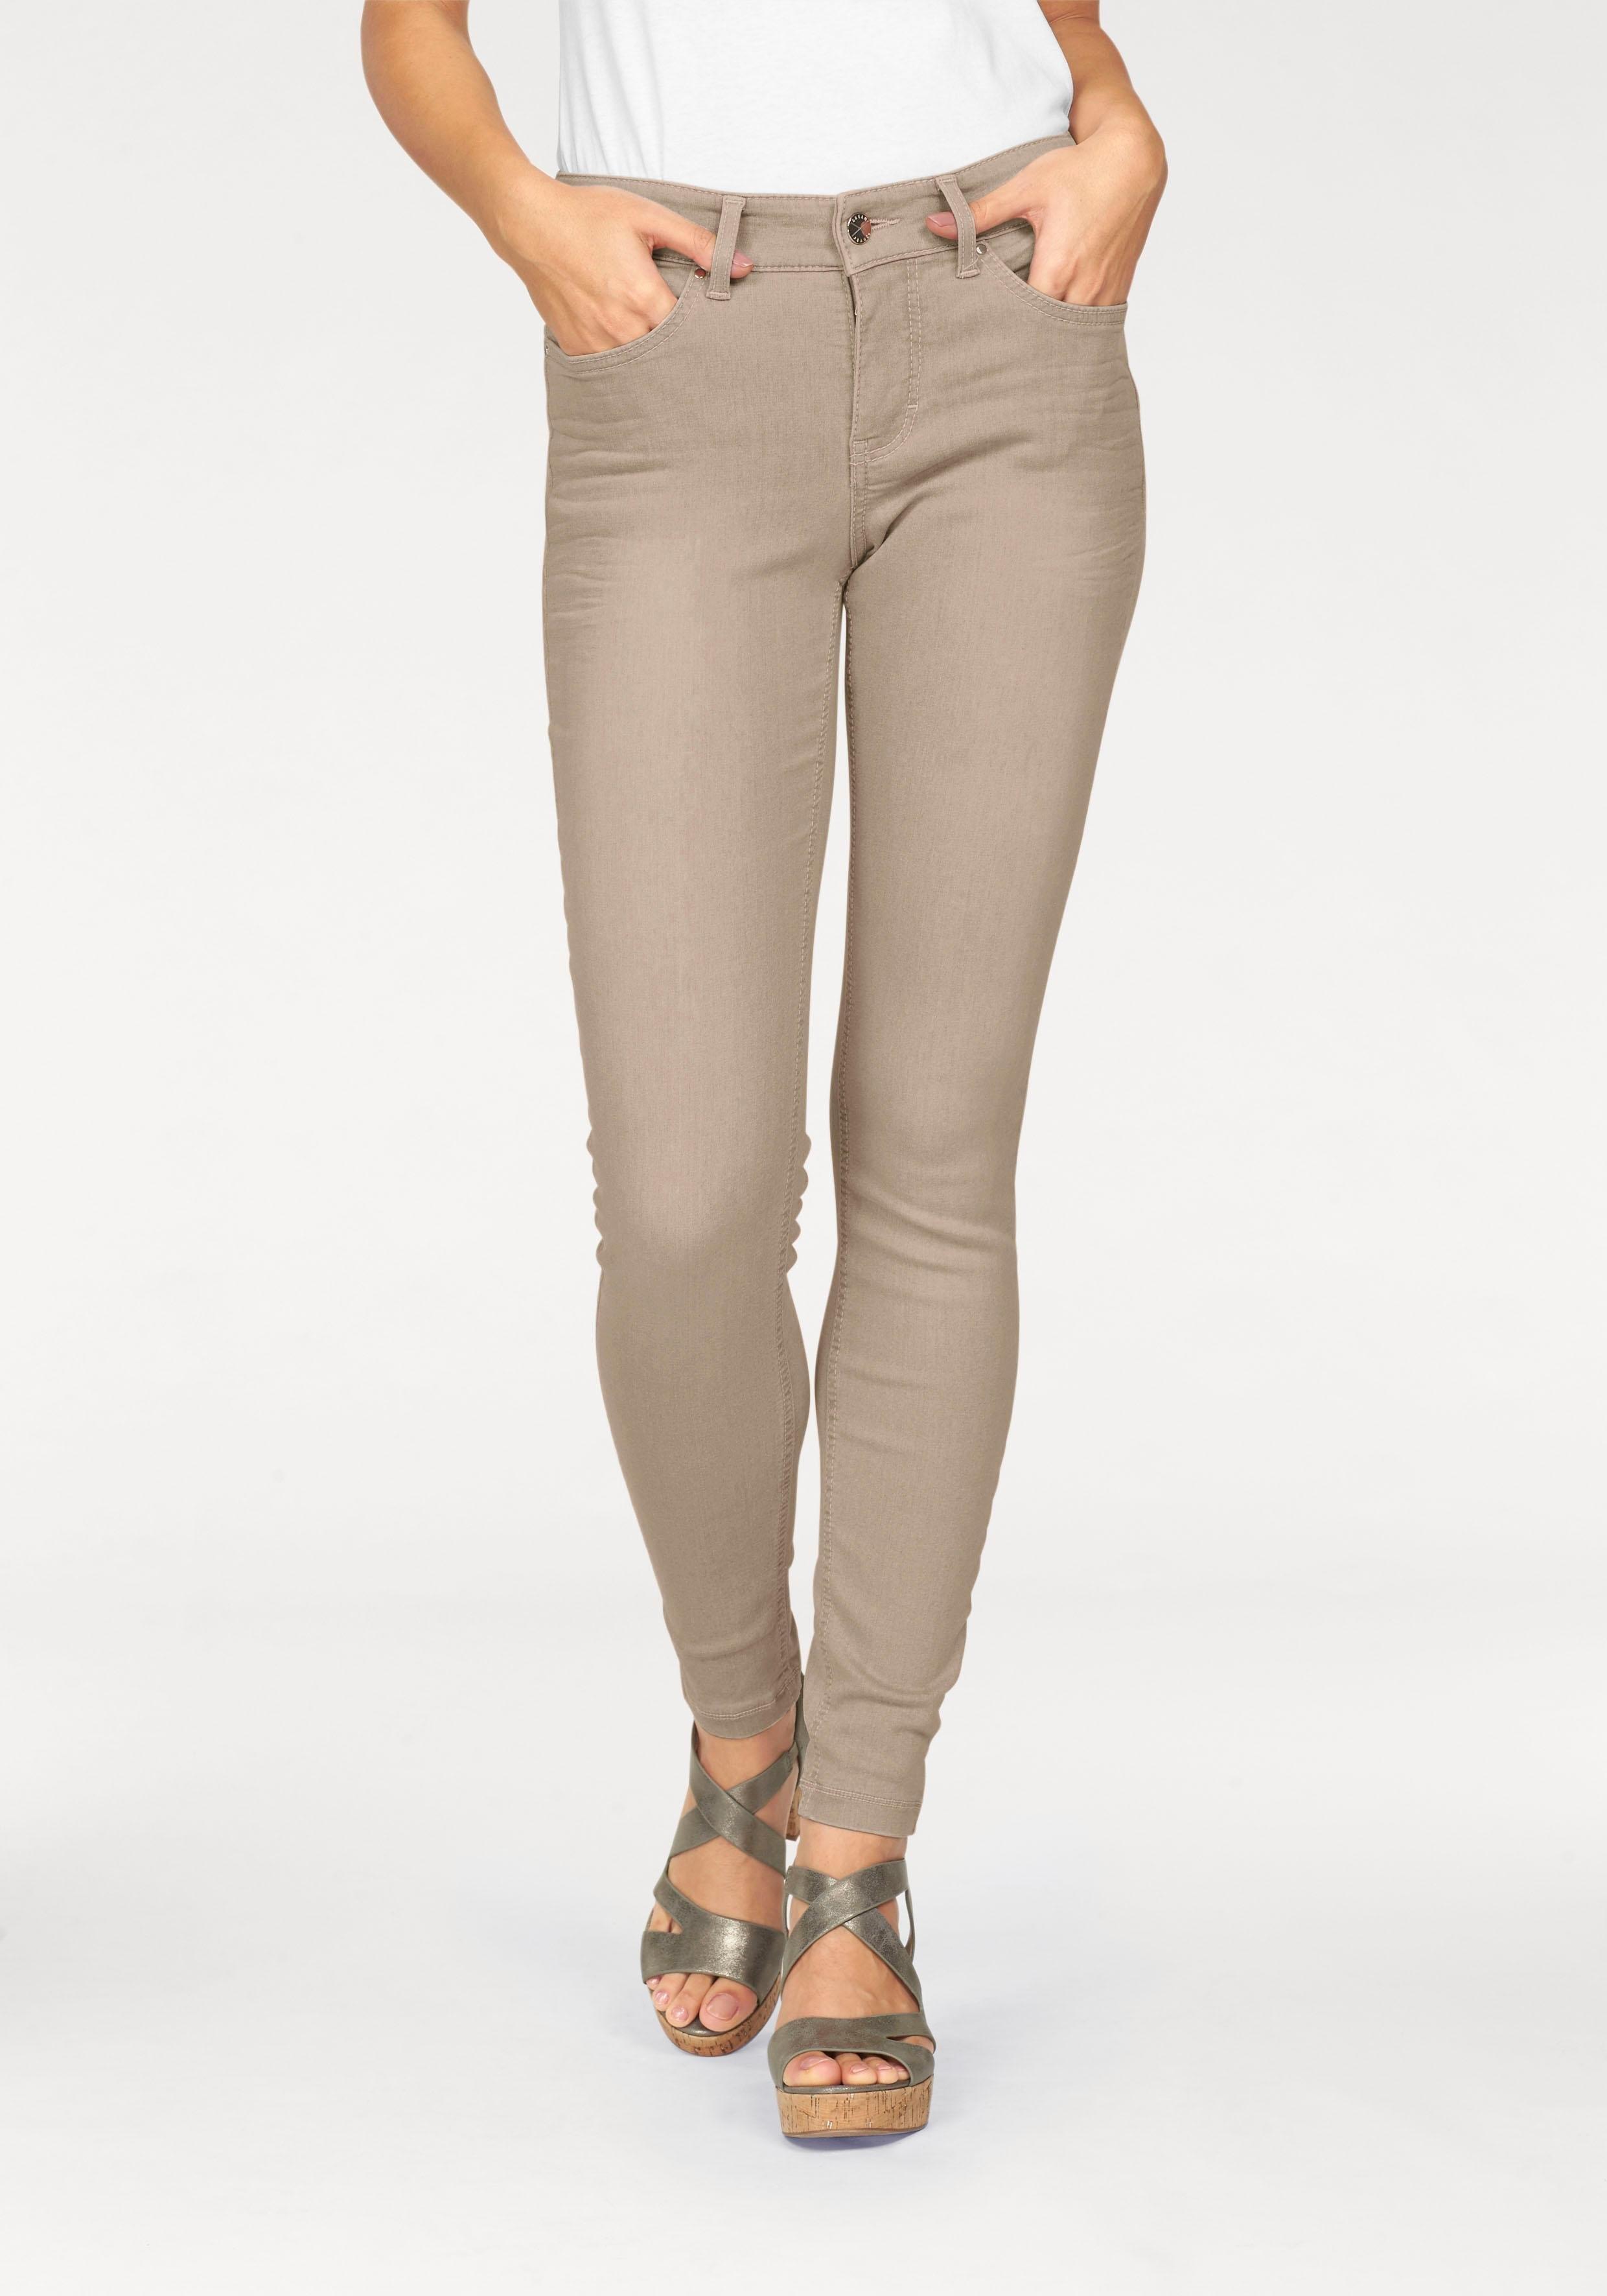 mac rechte jeans dream skinny bestel nu bij otto. Black Bedroom Furniture Sets. Home Design Ideas